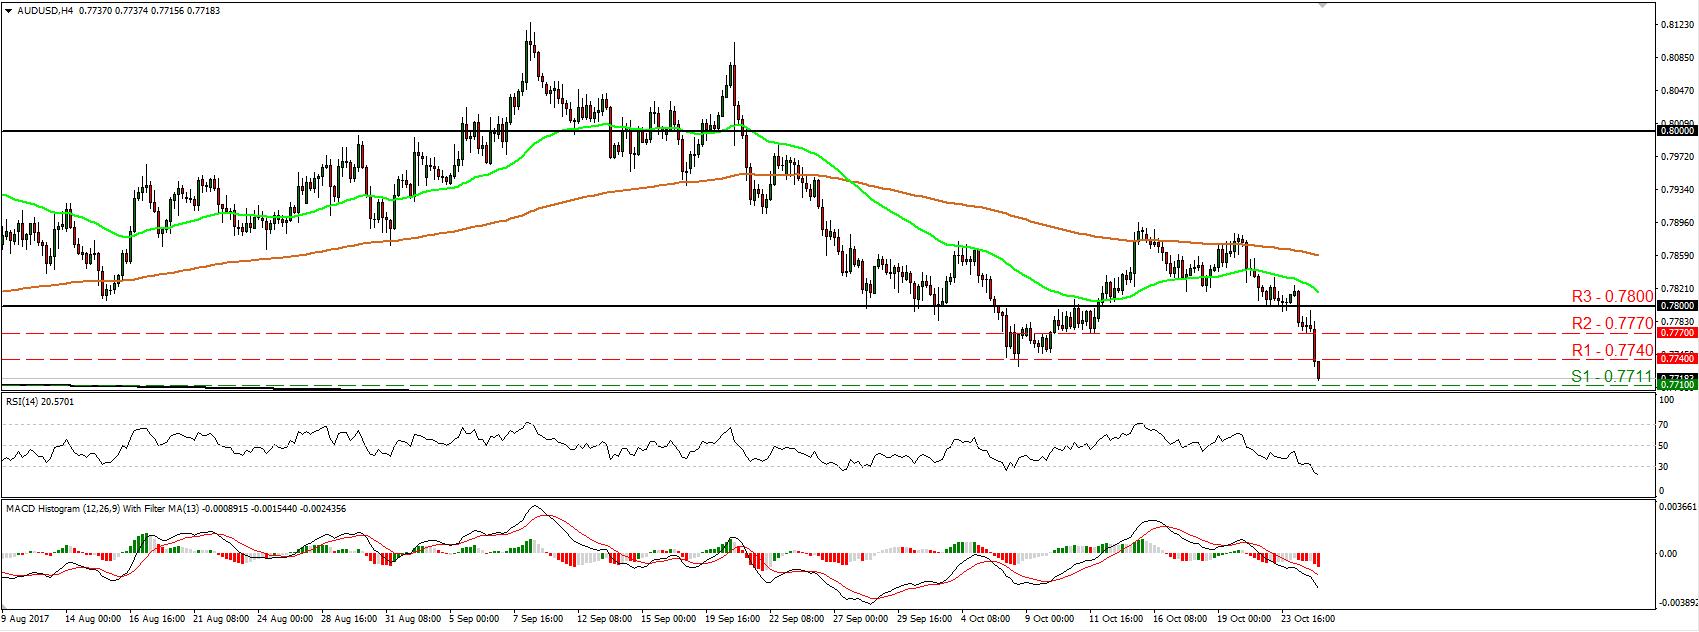 AUD/USD 25 Oct 2017   Econ Alerts